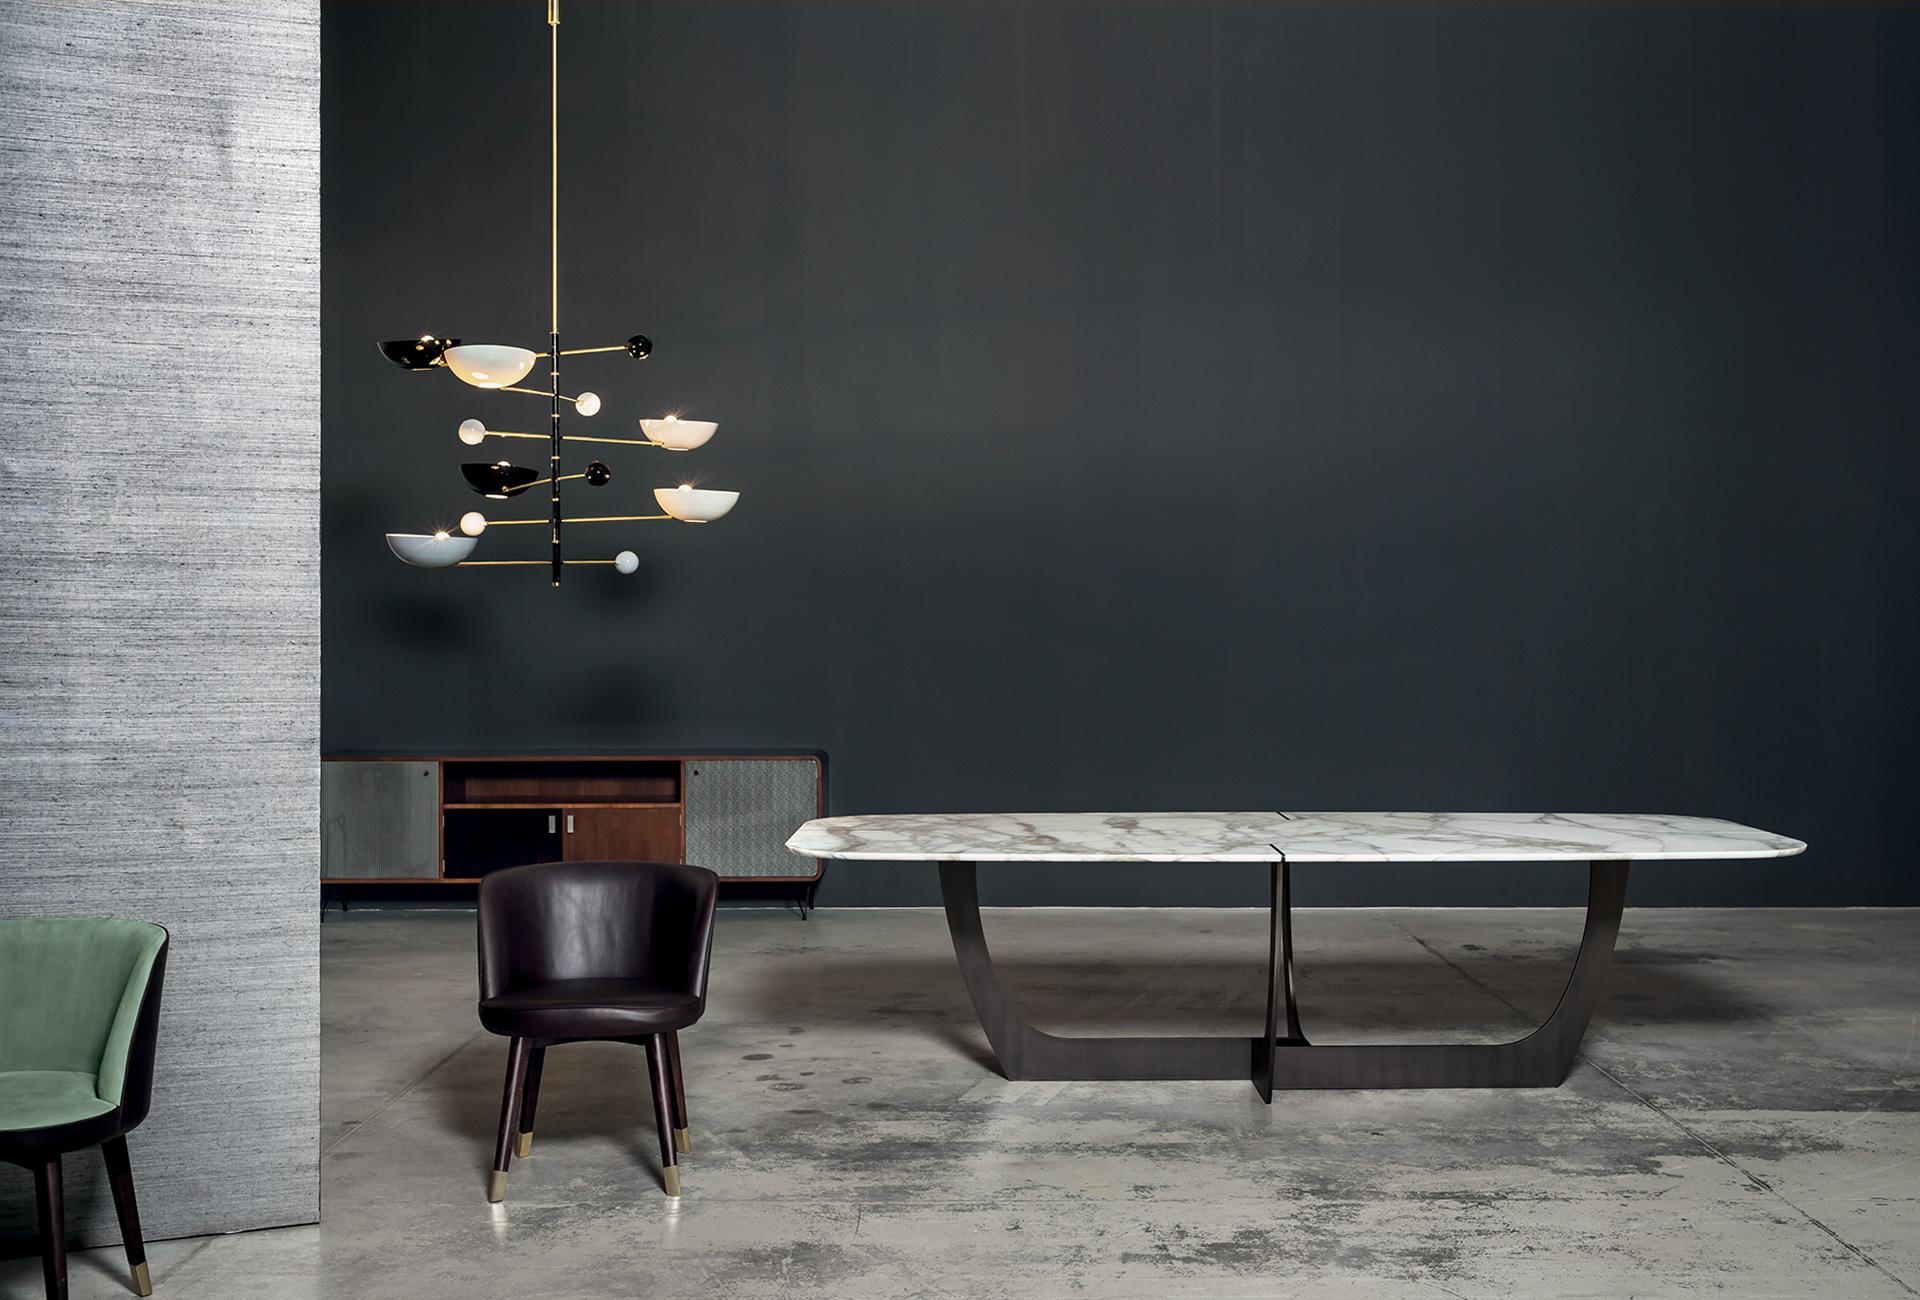 Baxter romeo table.jpg